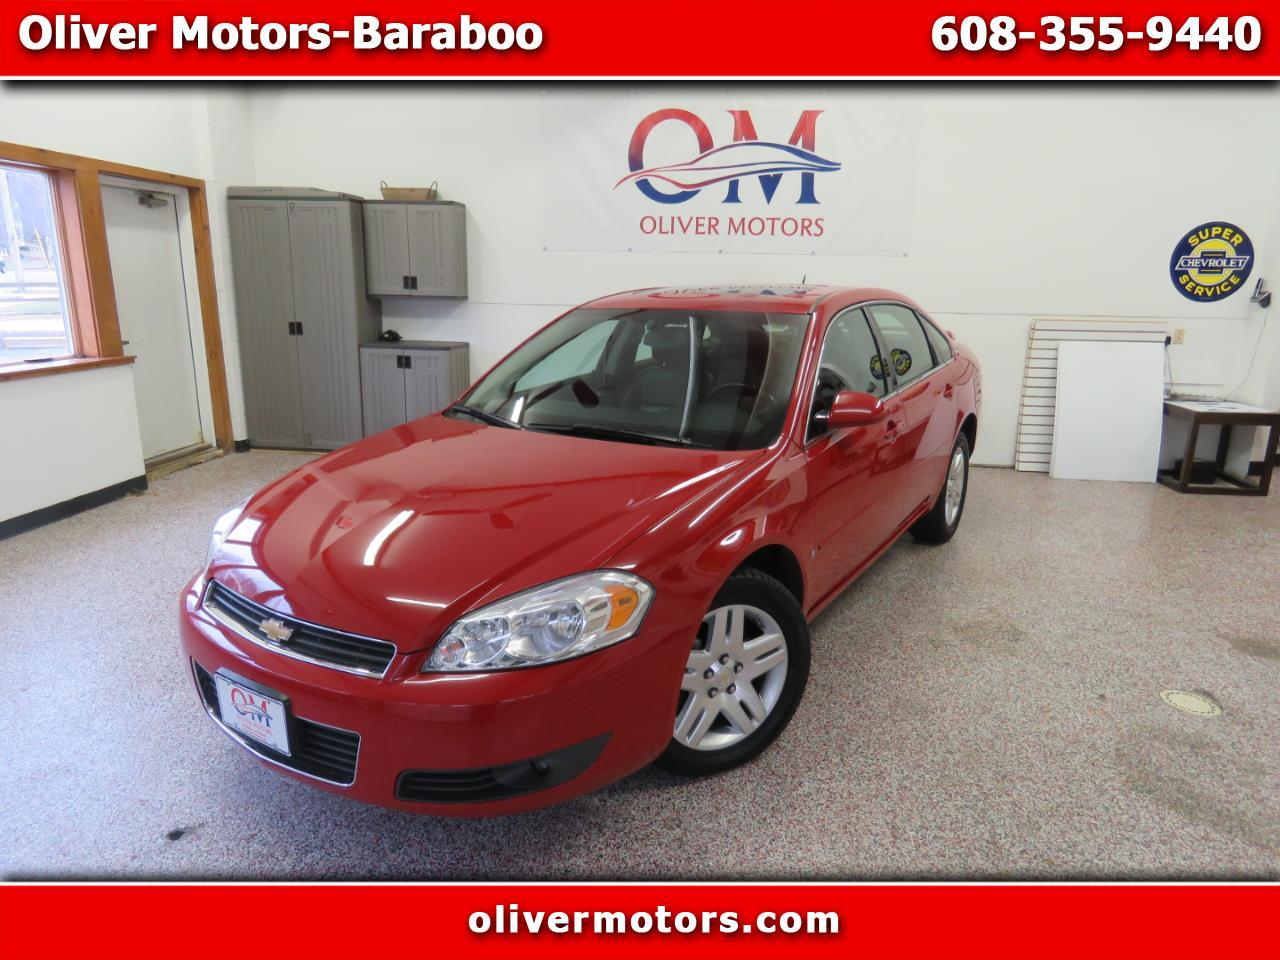 Chevrolet Impala 4dr Sdn 3.9L LT 2007